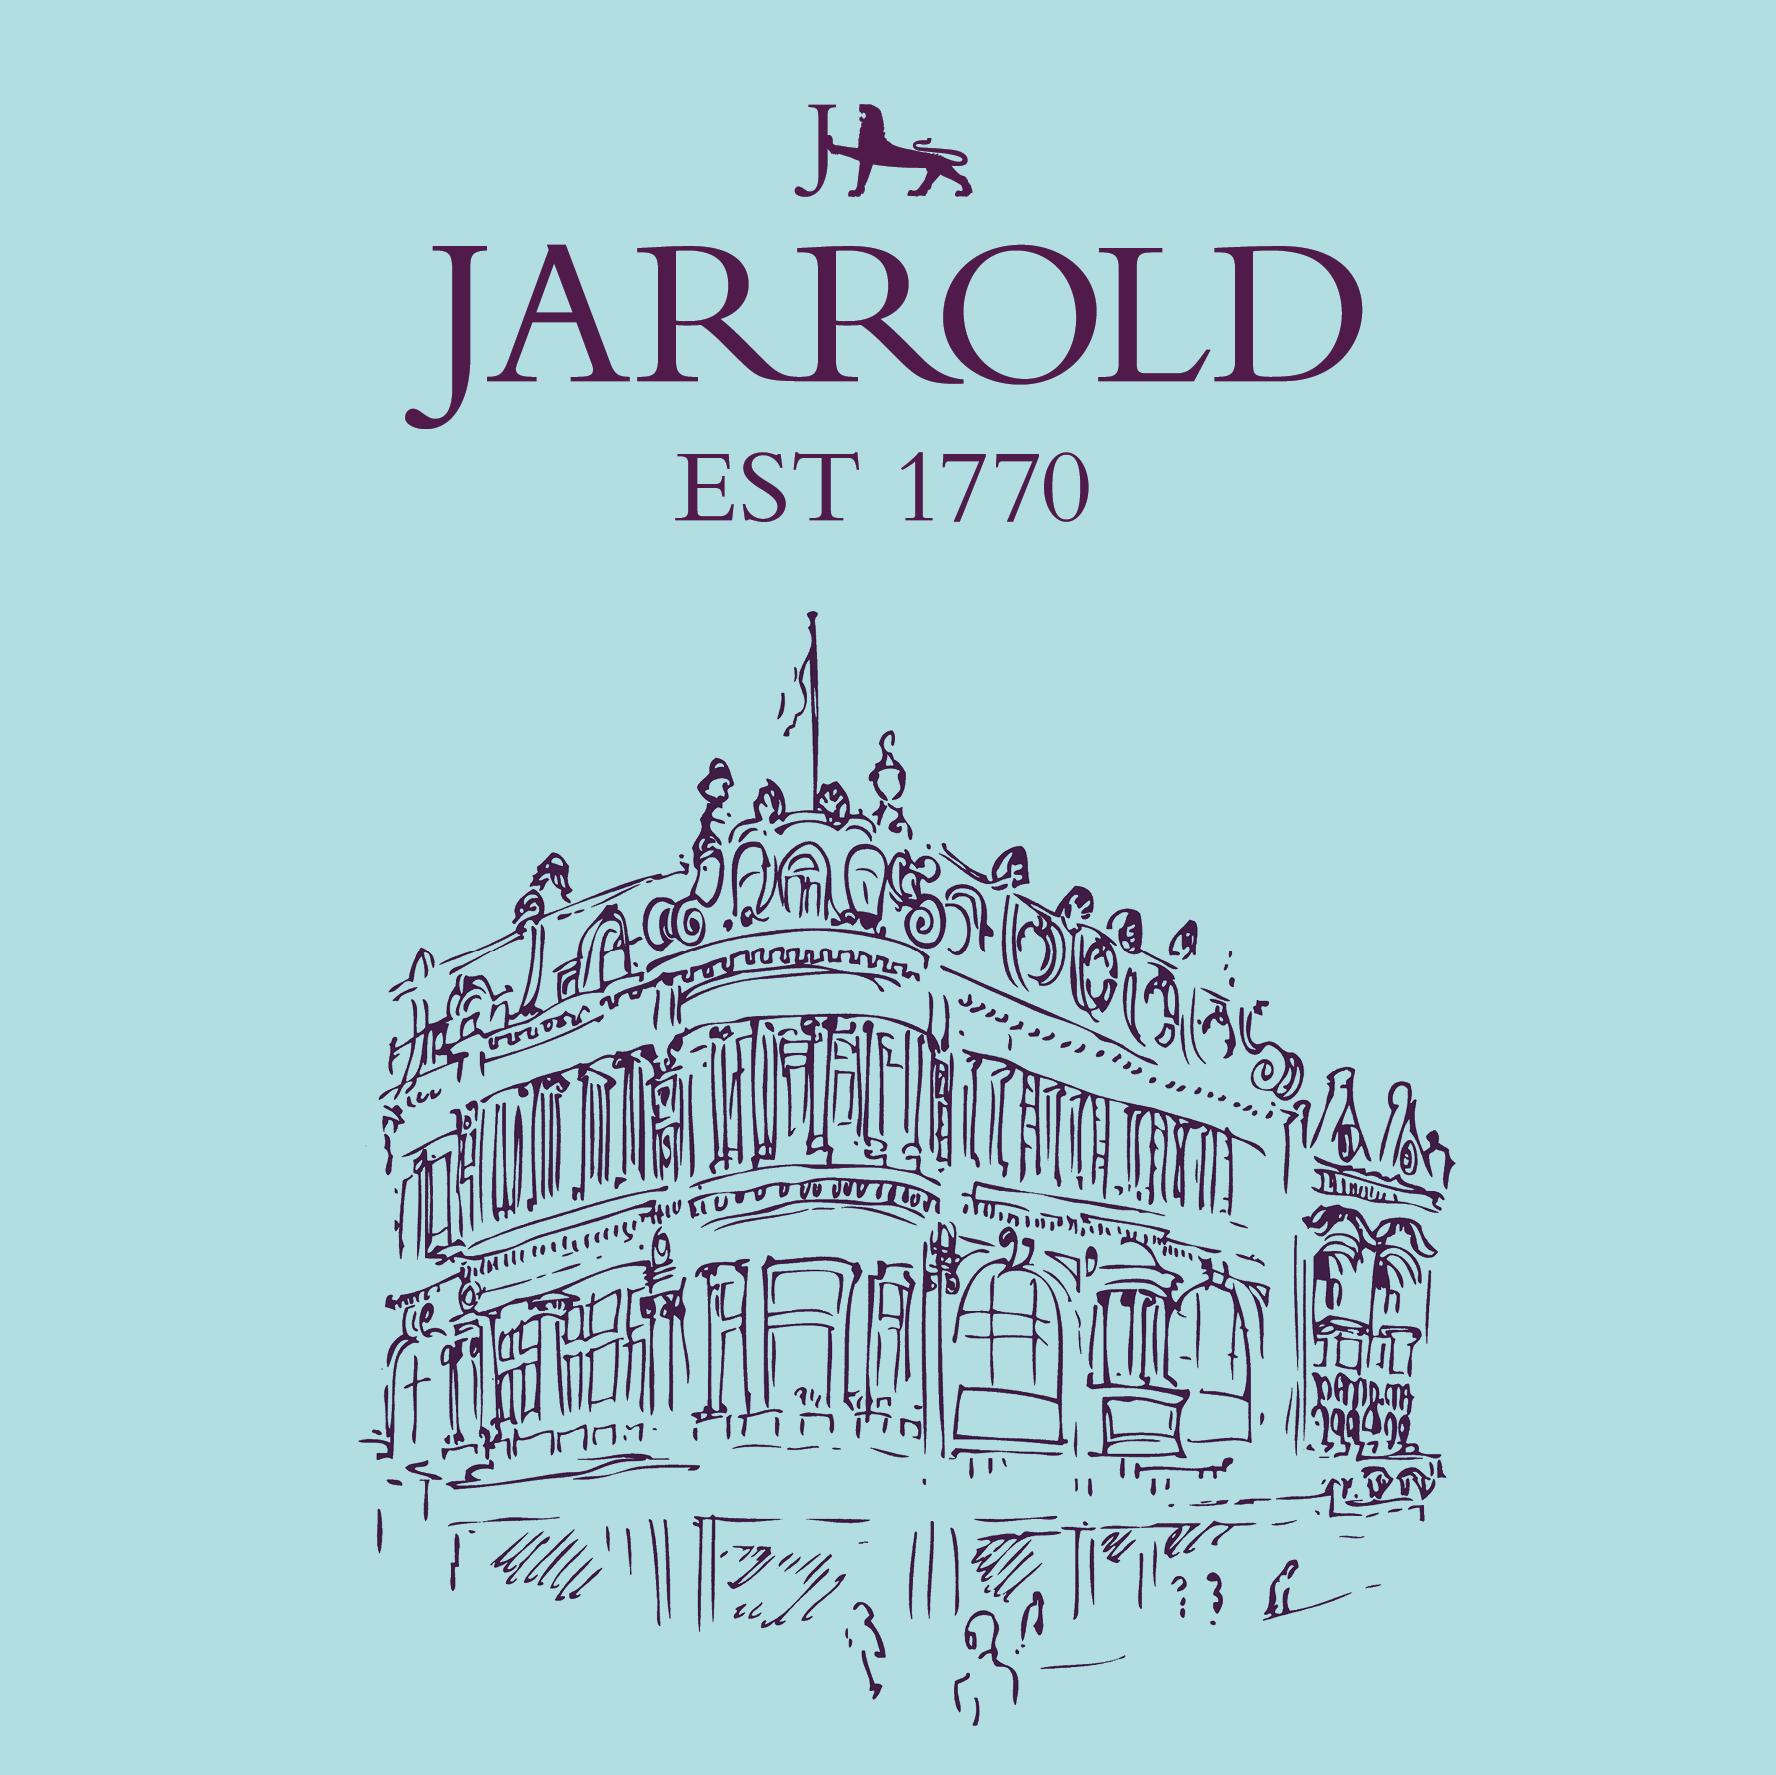 Jarrold 250 Years